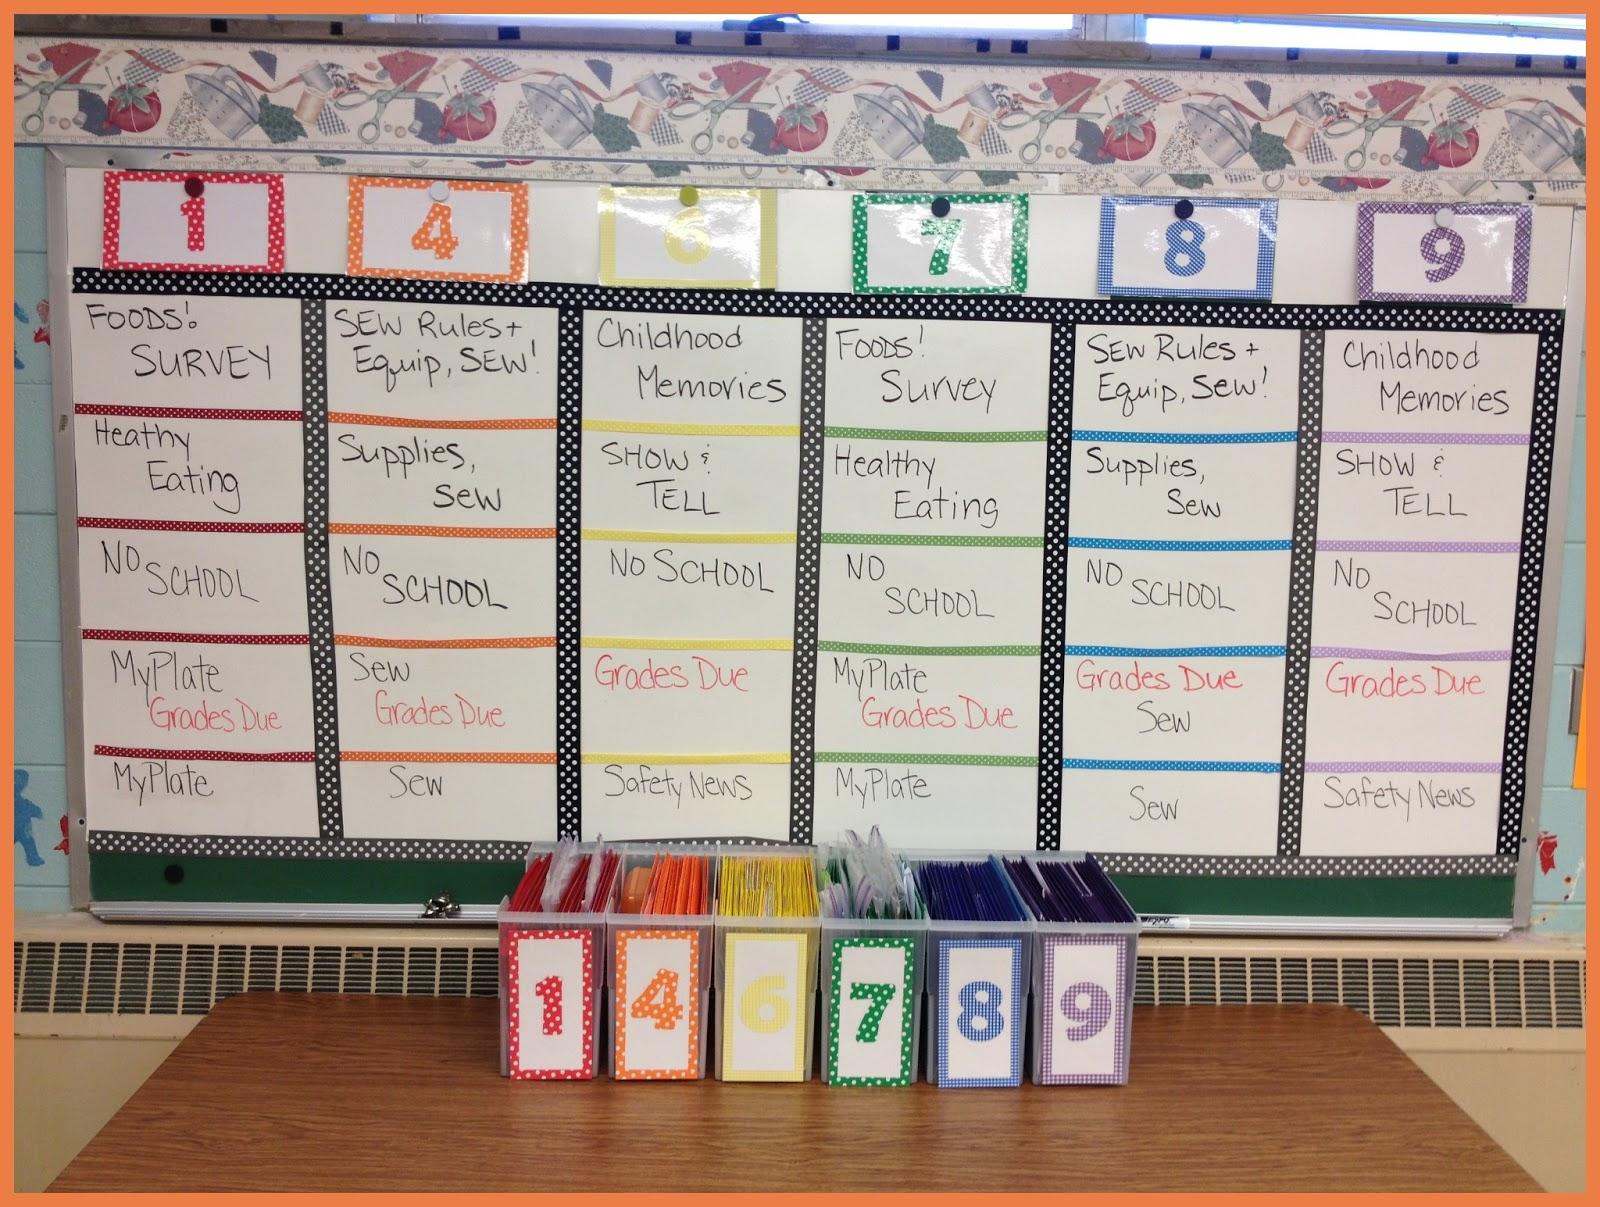 Classroom Whiteboard Decoration Ideas : Facs classroom ideas chalkboard to dry erase board